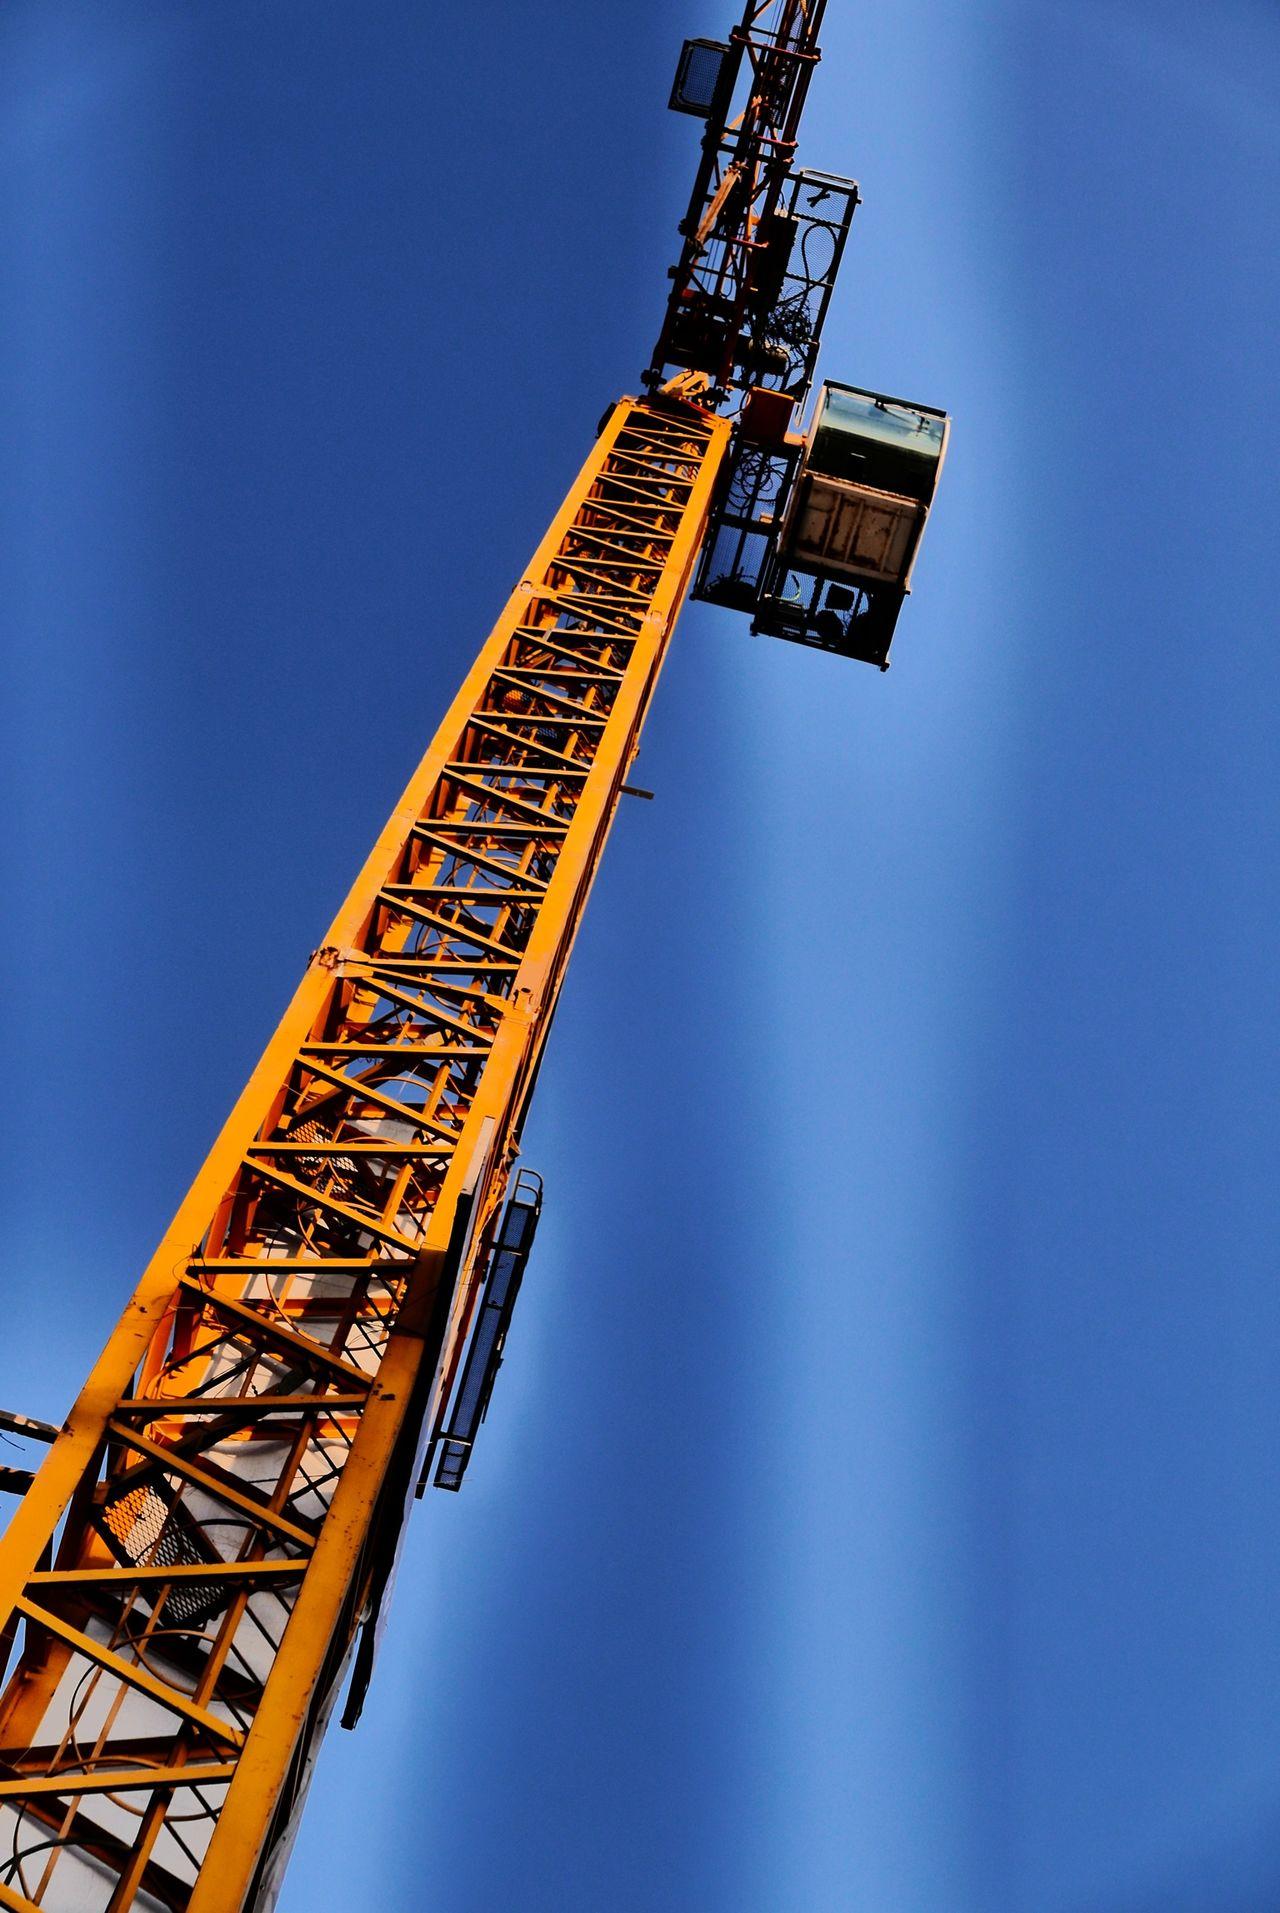 Construction crane against blue sky at dusk using filter Impressive art Filter Blue Sky Crane Construction Construction Crane